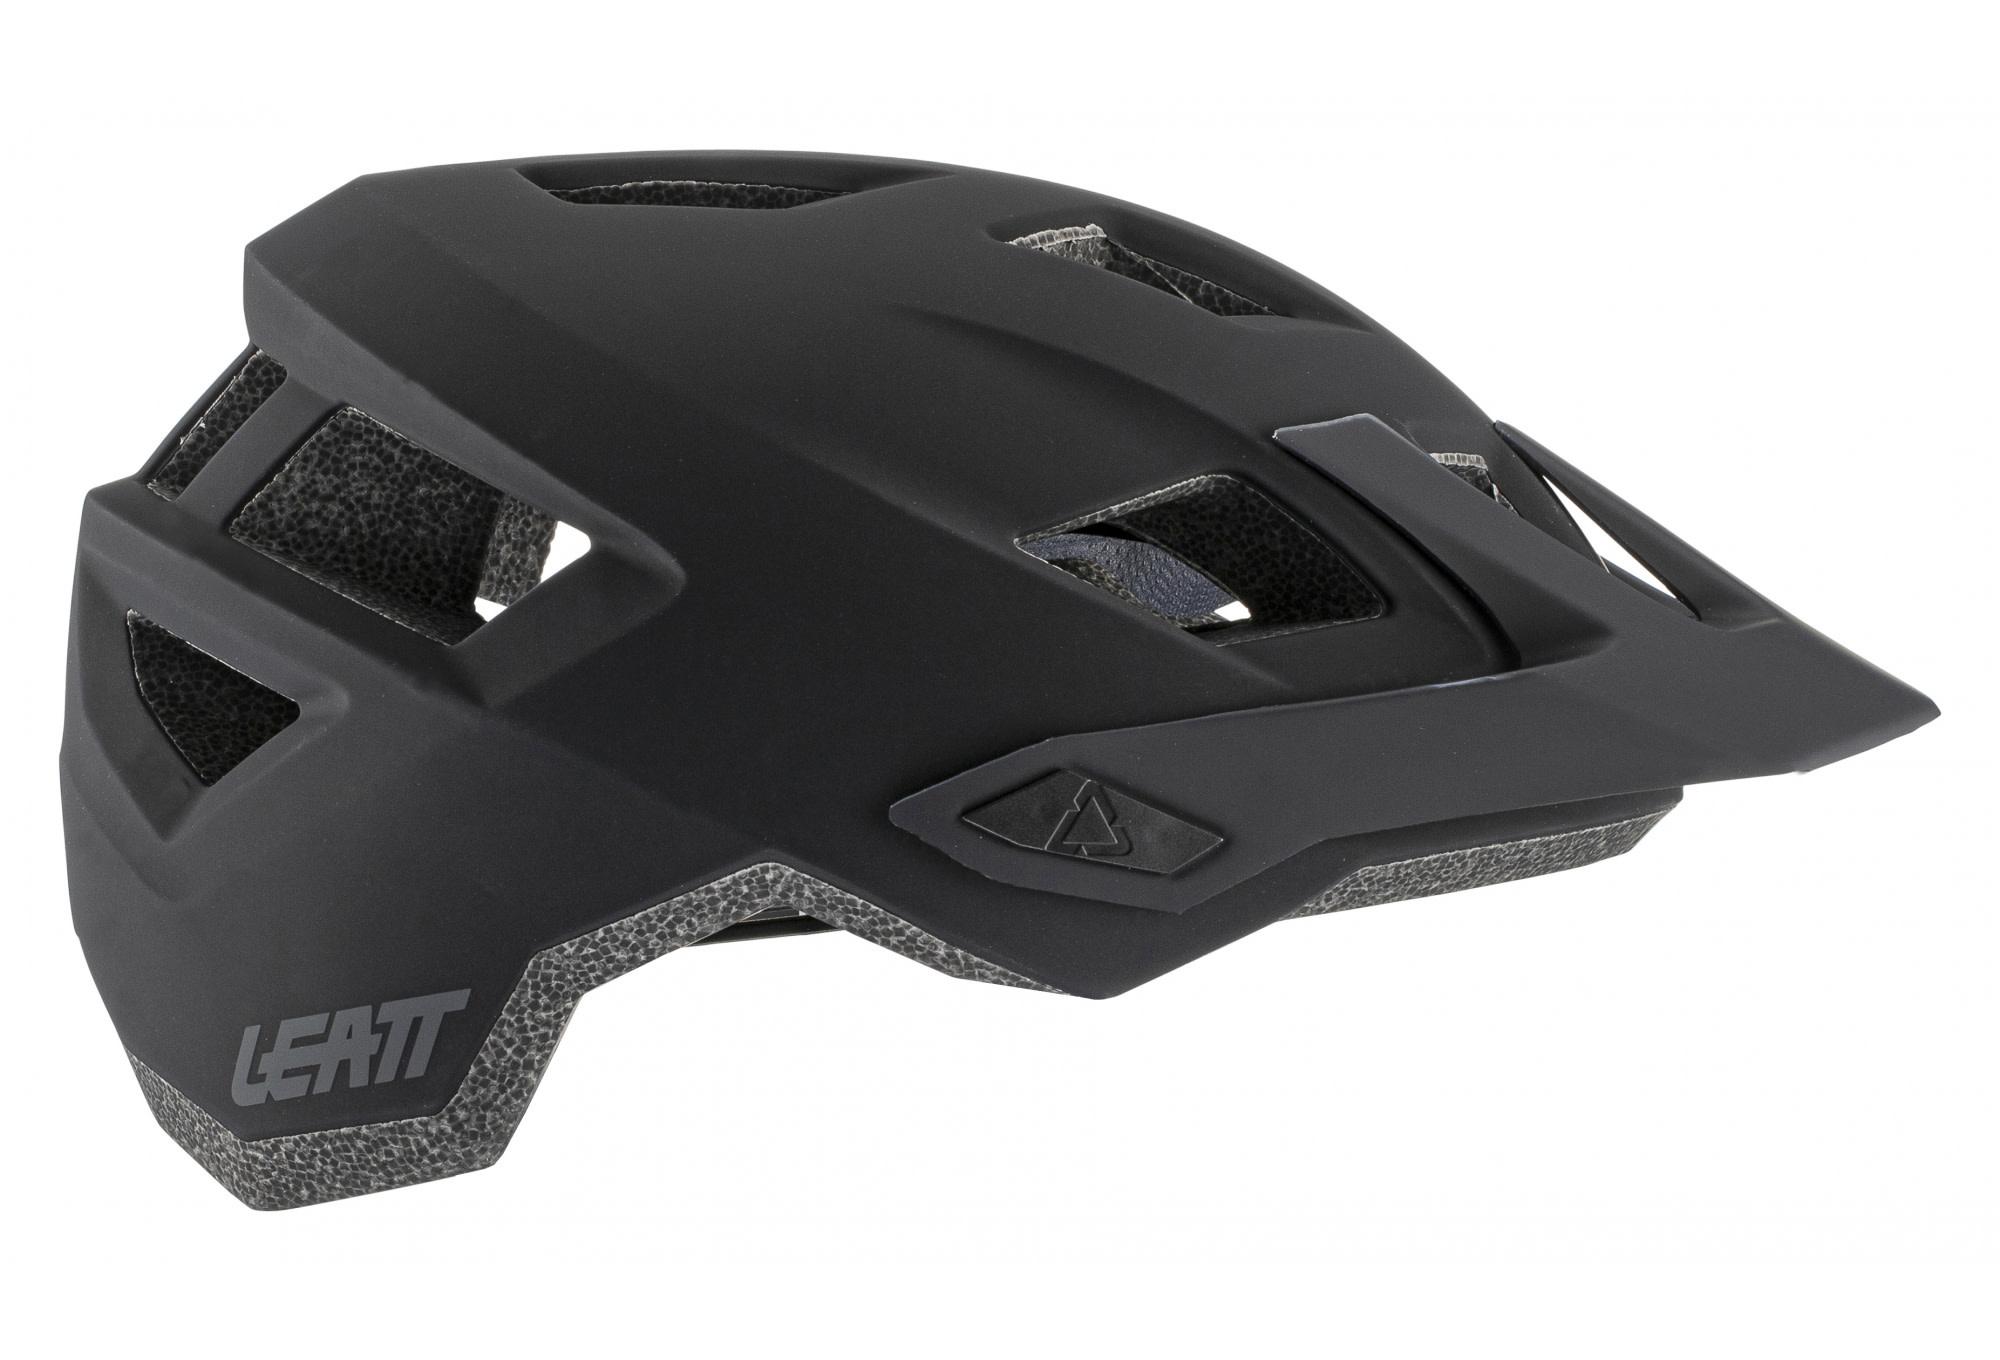 Leatt Leatt, MTB 1.0 Mtn, Helmet, Black, L, 59 - 63cm